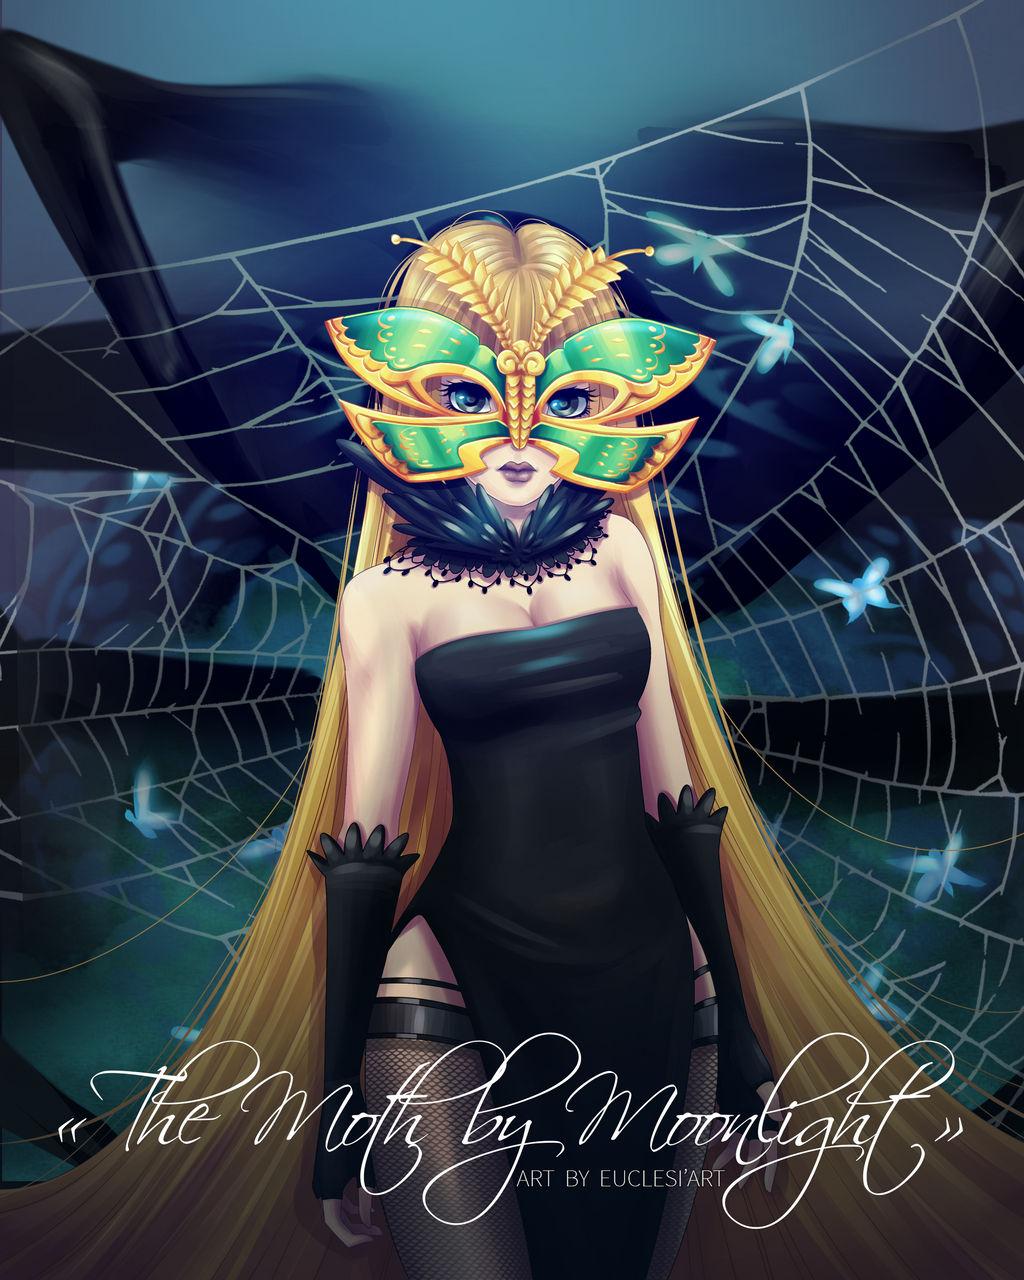 [Euclesiart] Trinity, the Moth by Moonlight